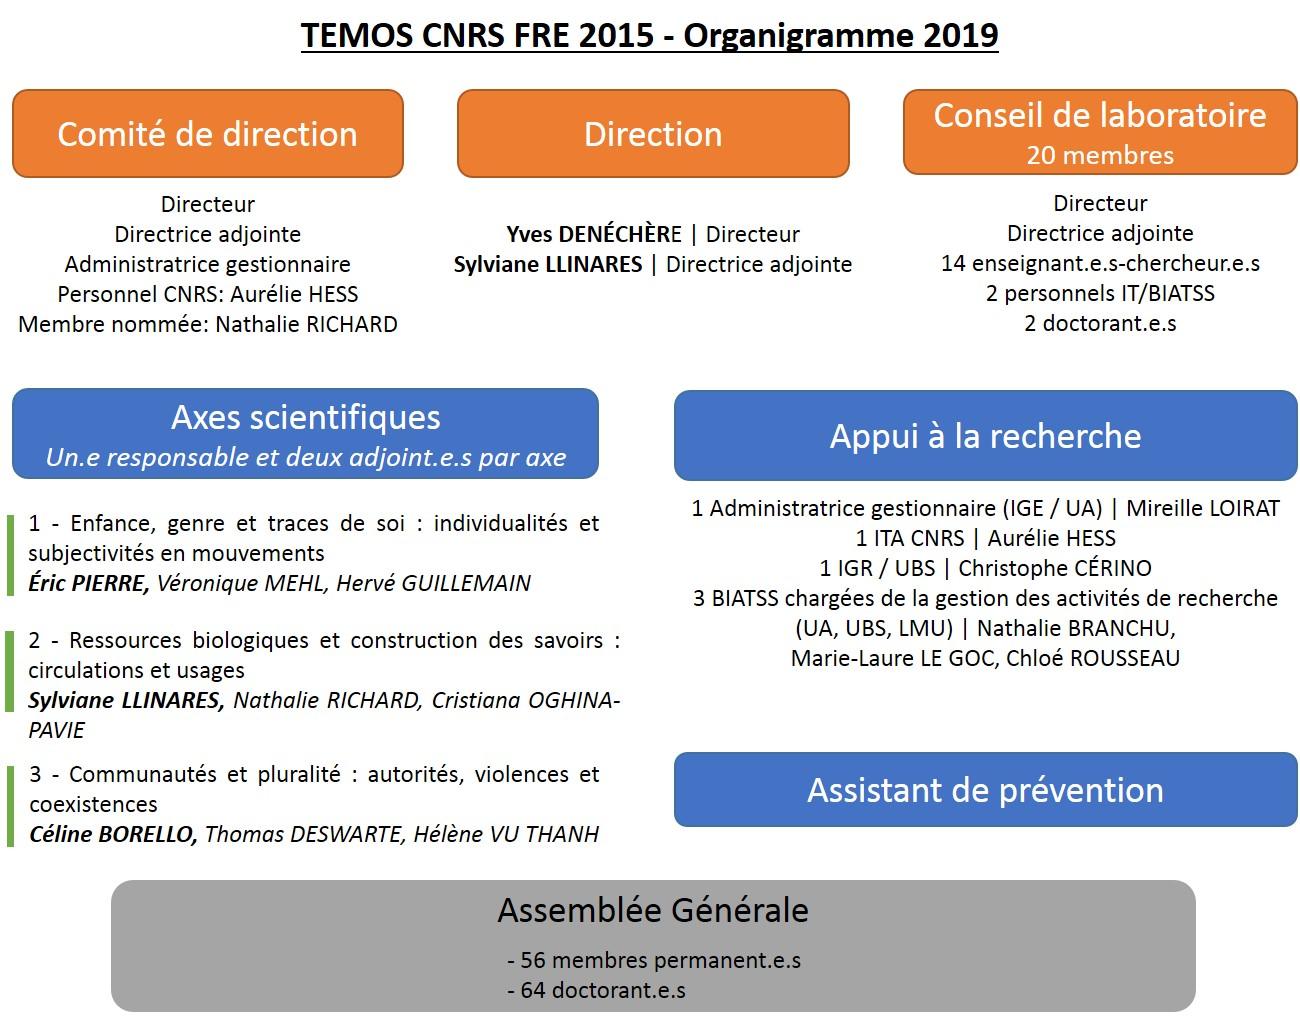 Organigramme de TEMOS